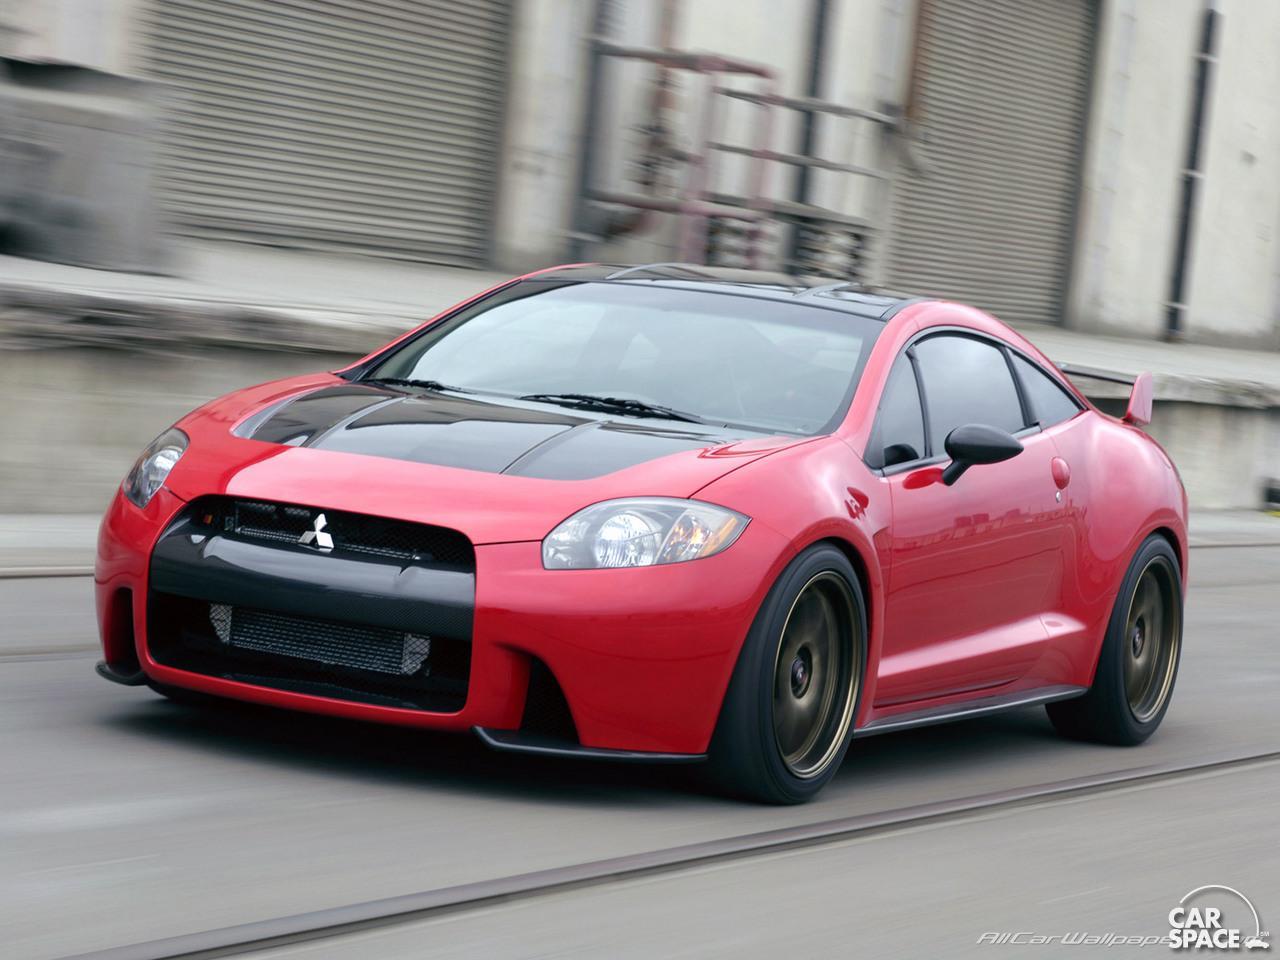 Mitsubishi Eclipse nissan Sports Cars Pictures Desktop Backgrounds